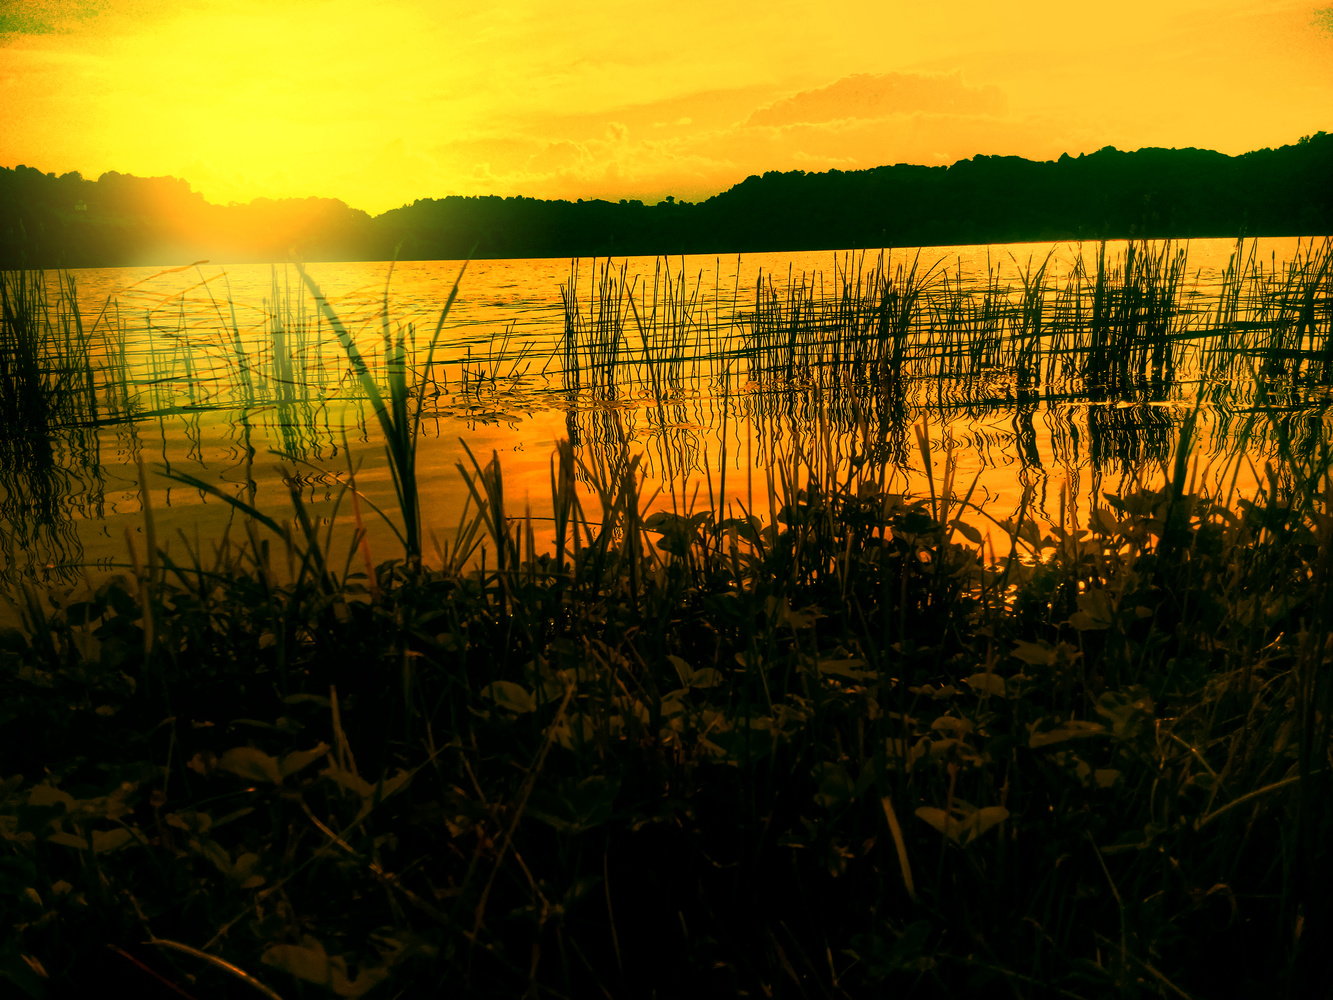 Lake in sunset by Dijana Kr